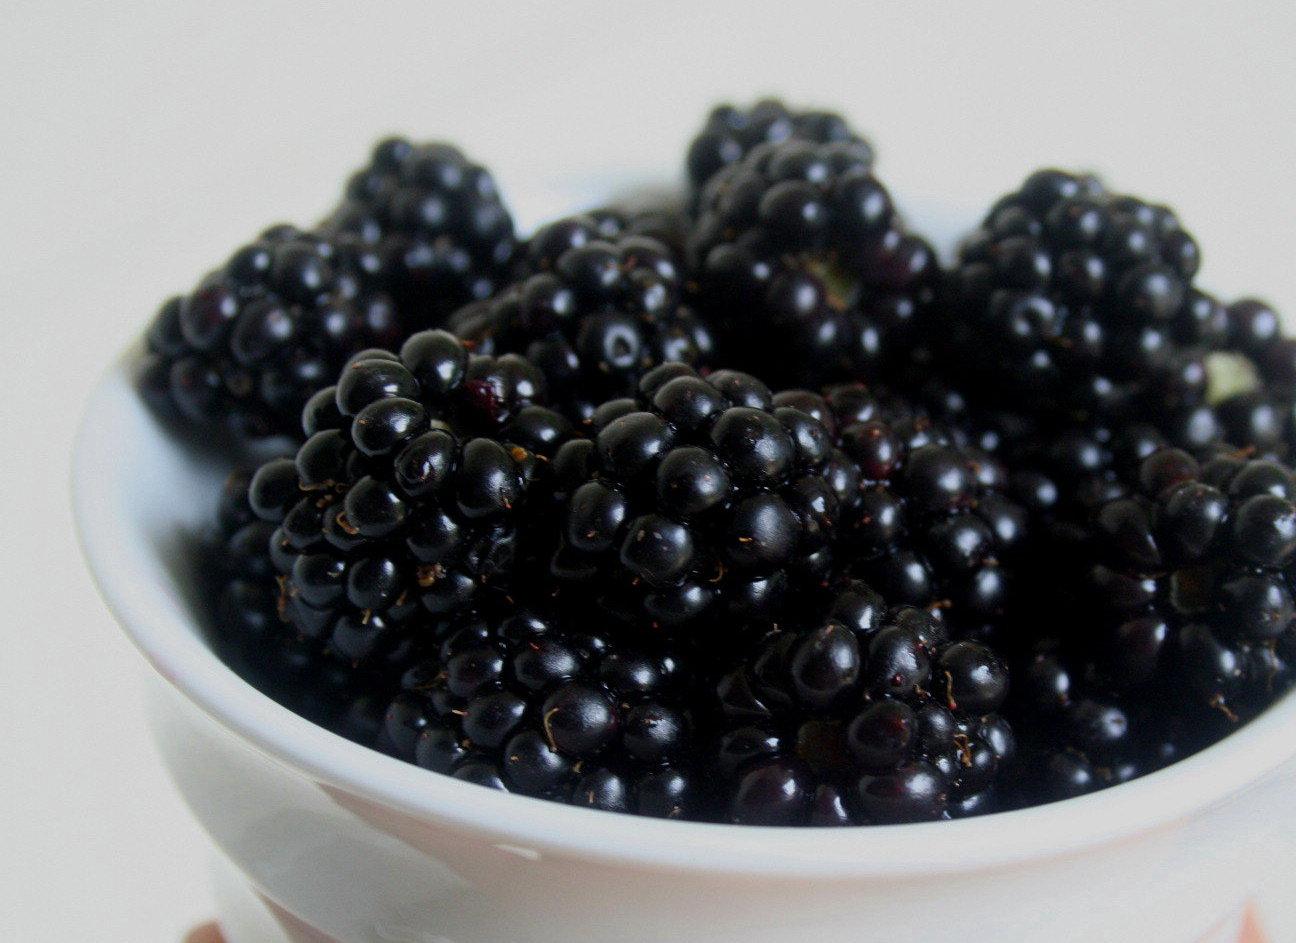 black berries Find great deals on ebay for black berries and black berries plant shop with confidence.